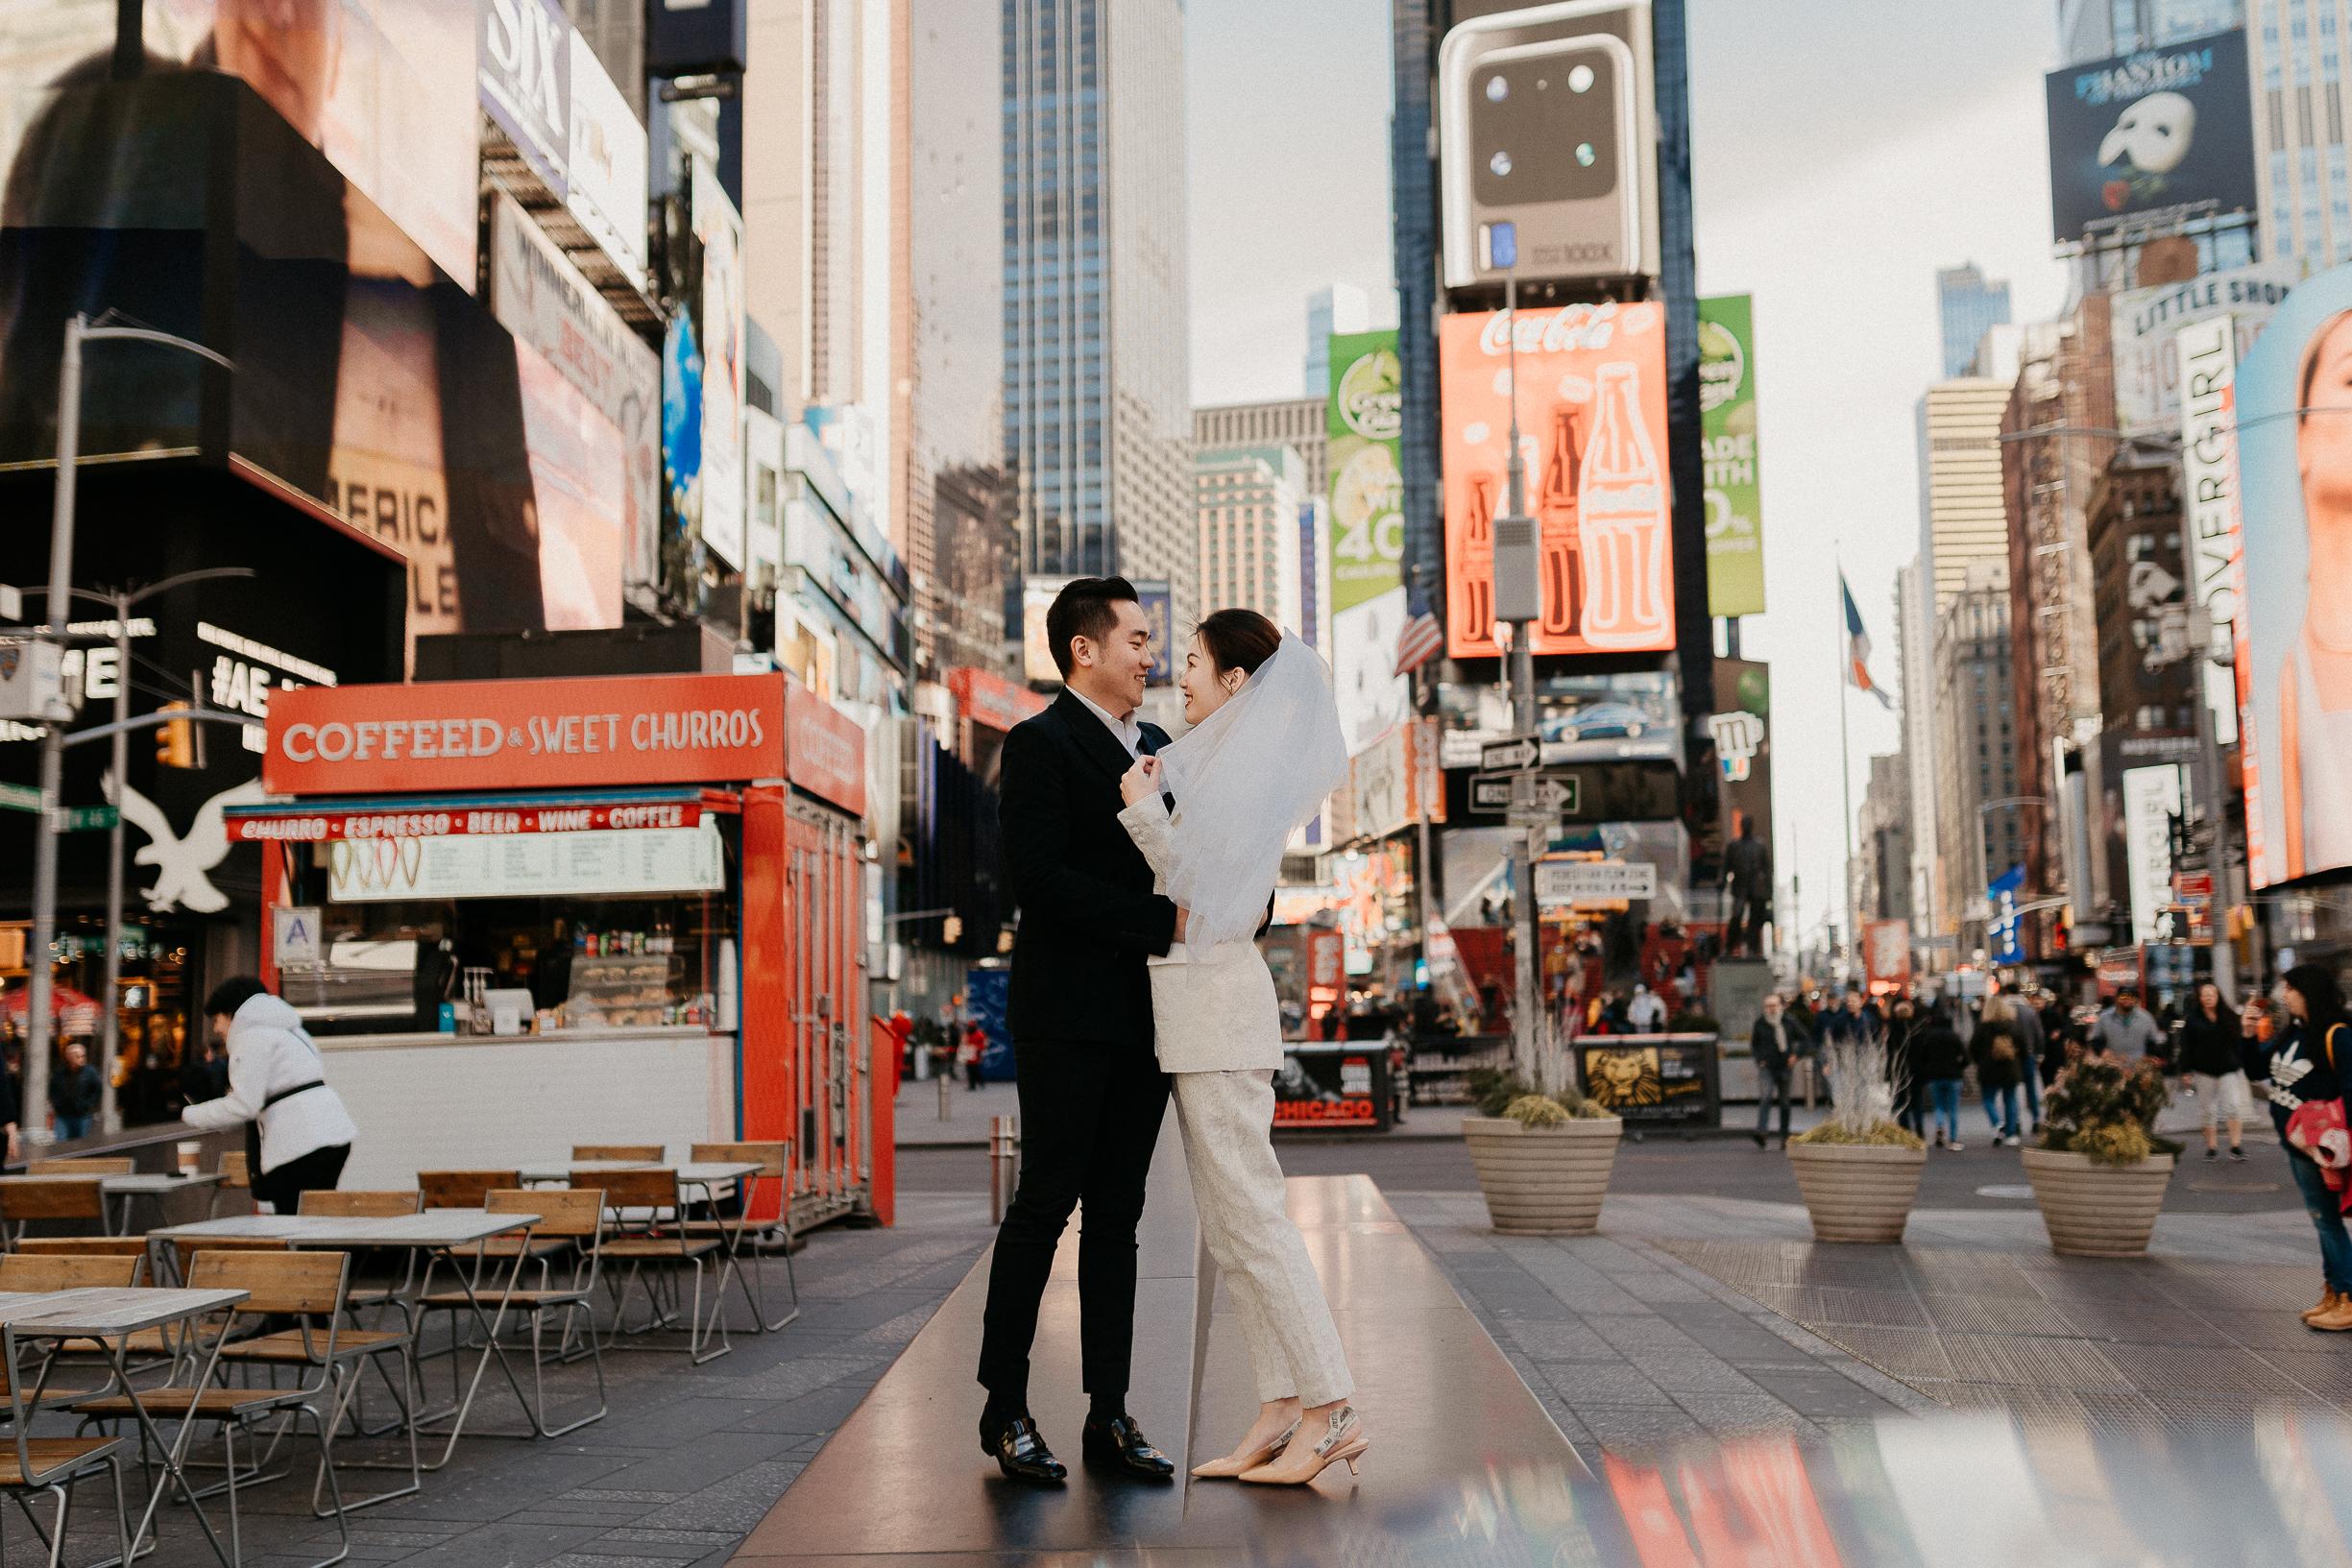 Times square pre-wedding photoshoot